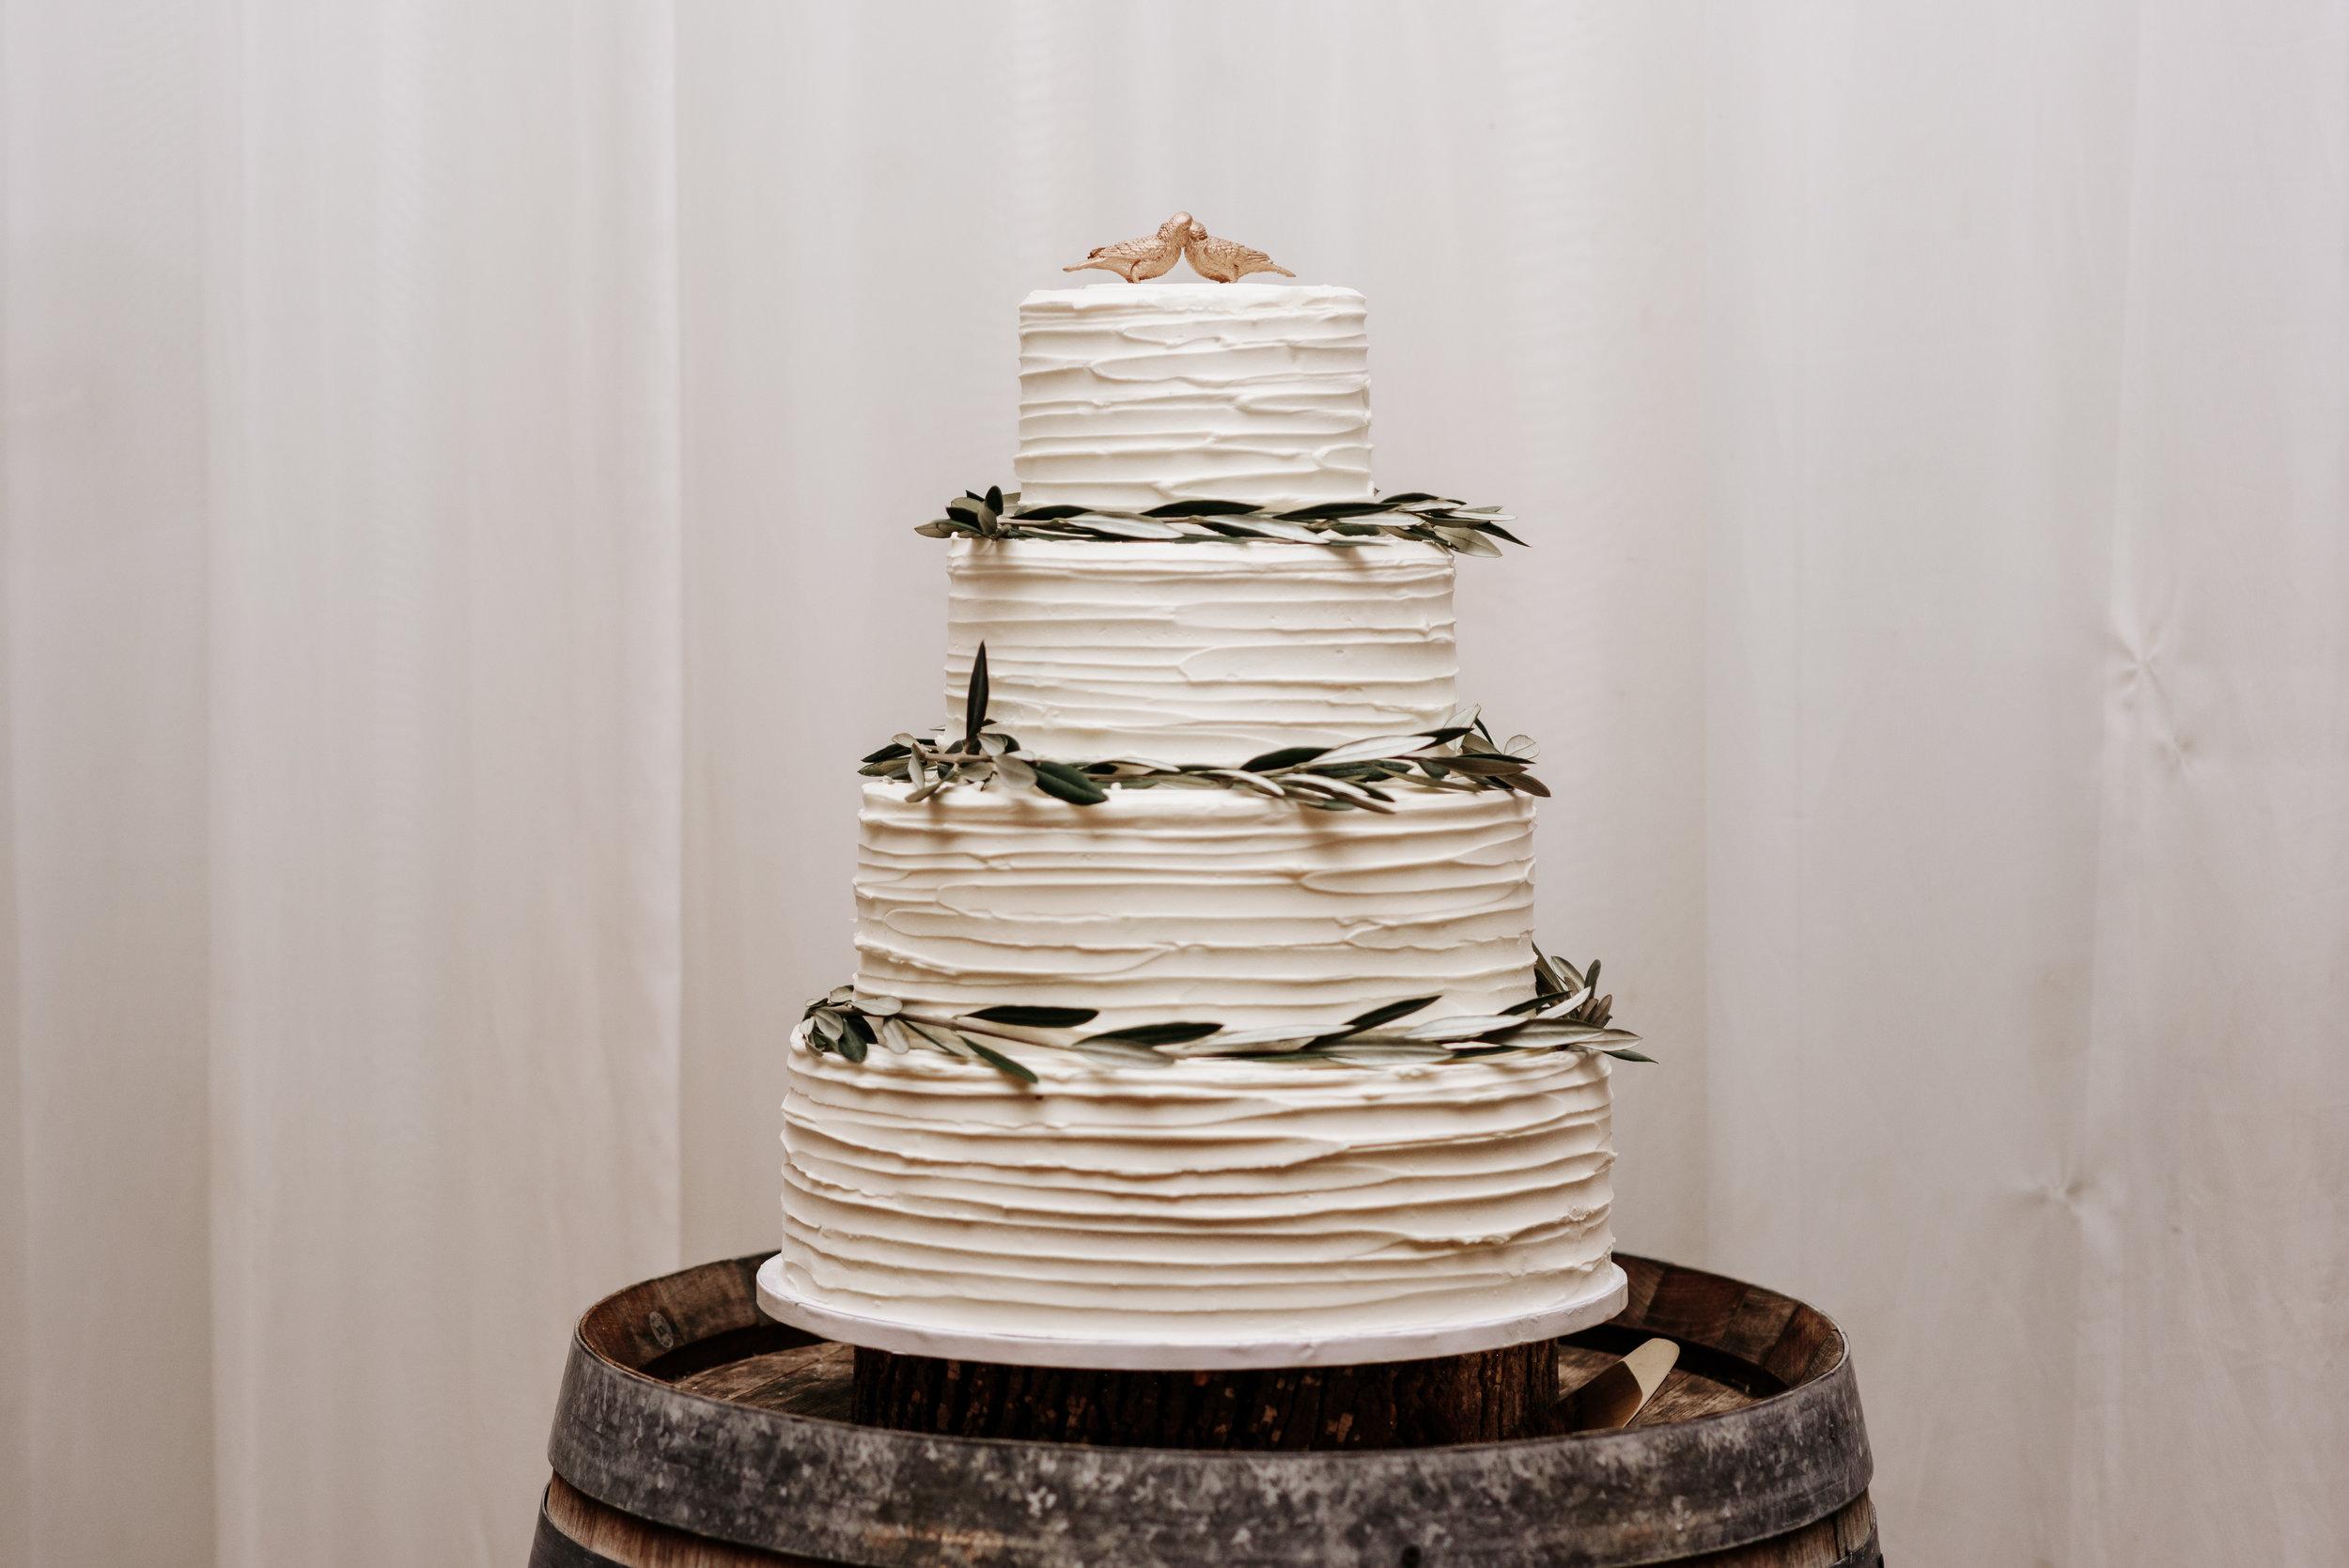 Veritas-Vineyards-and-Winery-Wedding-Photography-Afton-Virginia-Yasmin-Seth-Photography-by-V-2726.jpg